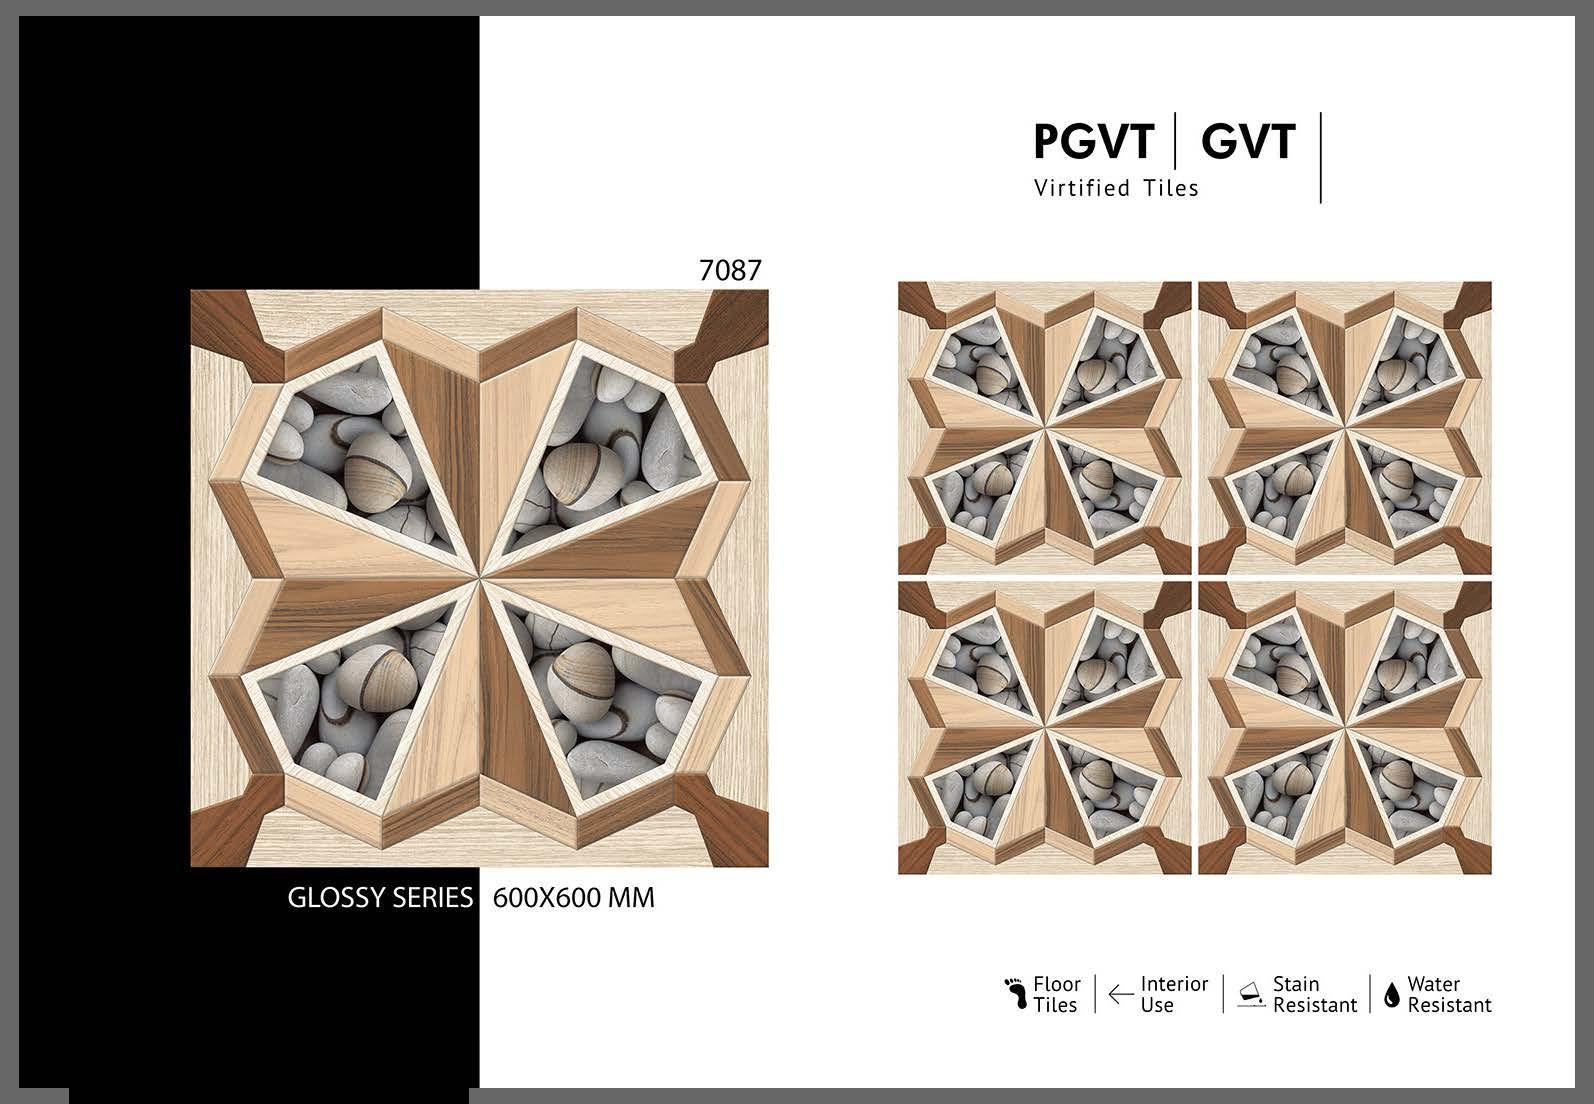 GVT 2X2 GLOSSY_Page_74.jpg